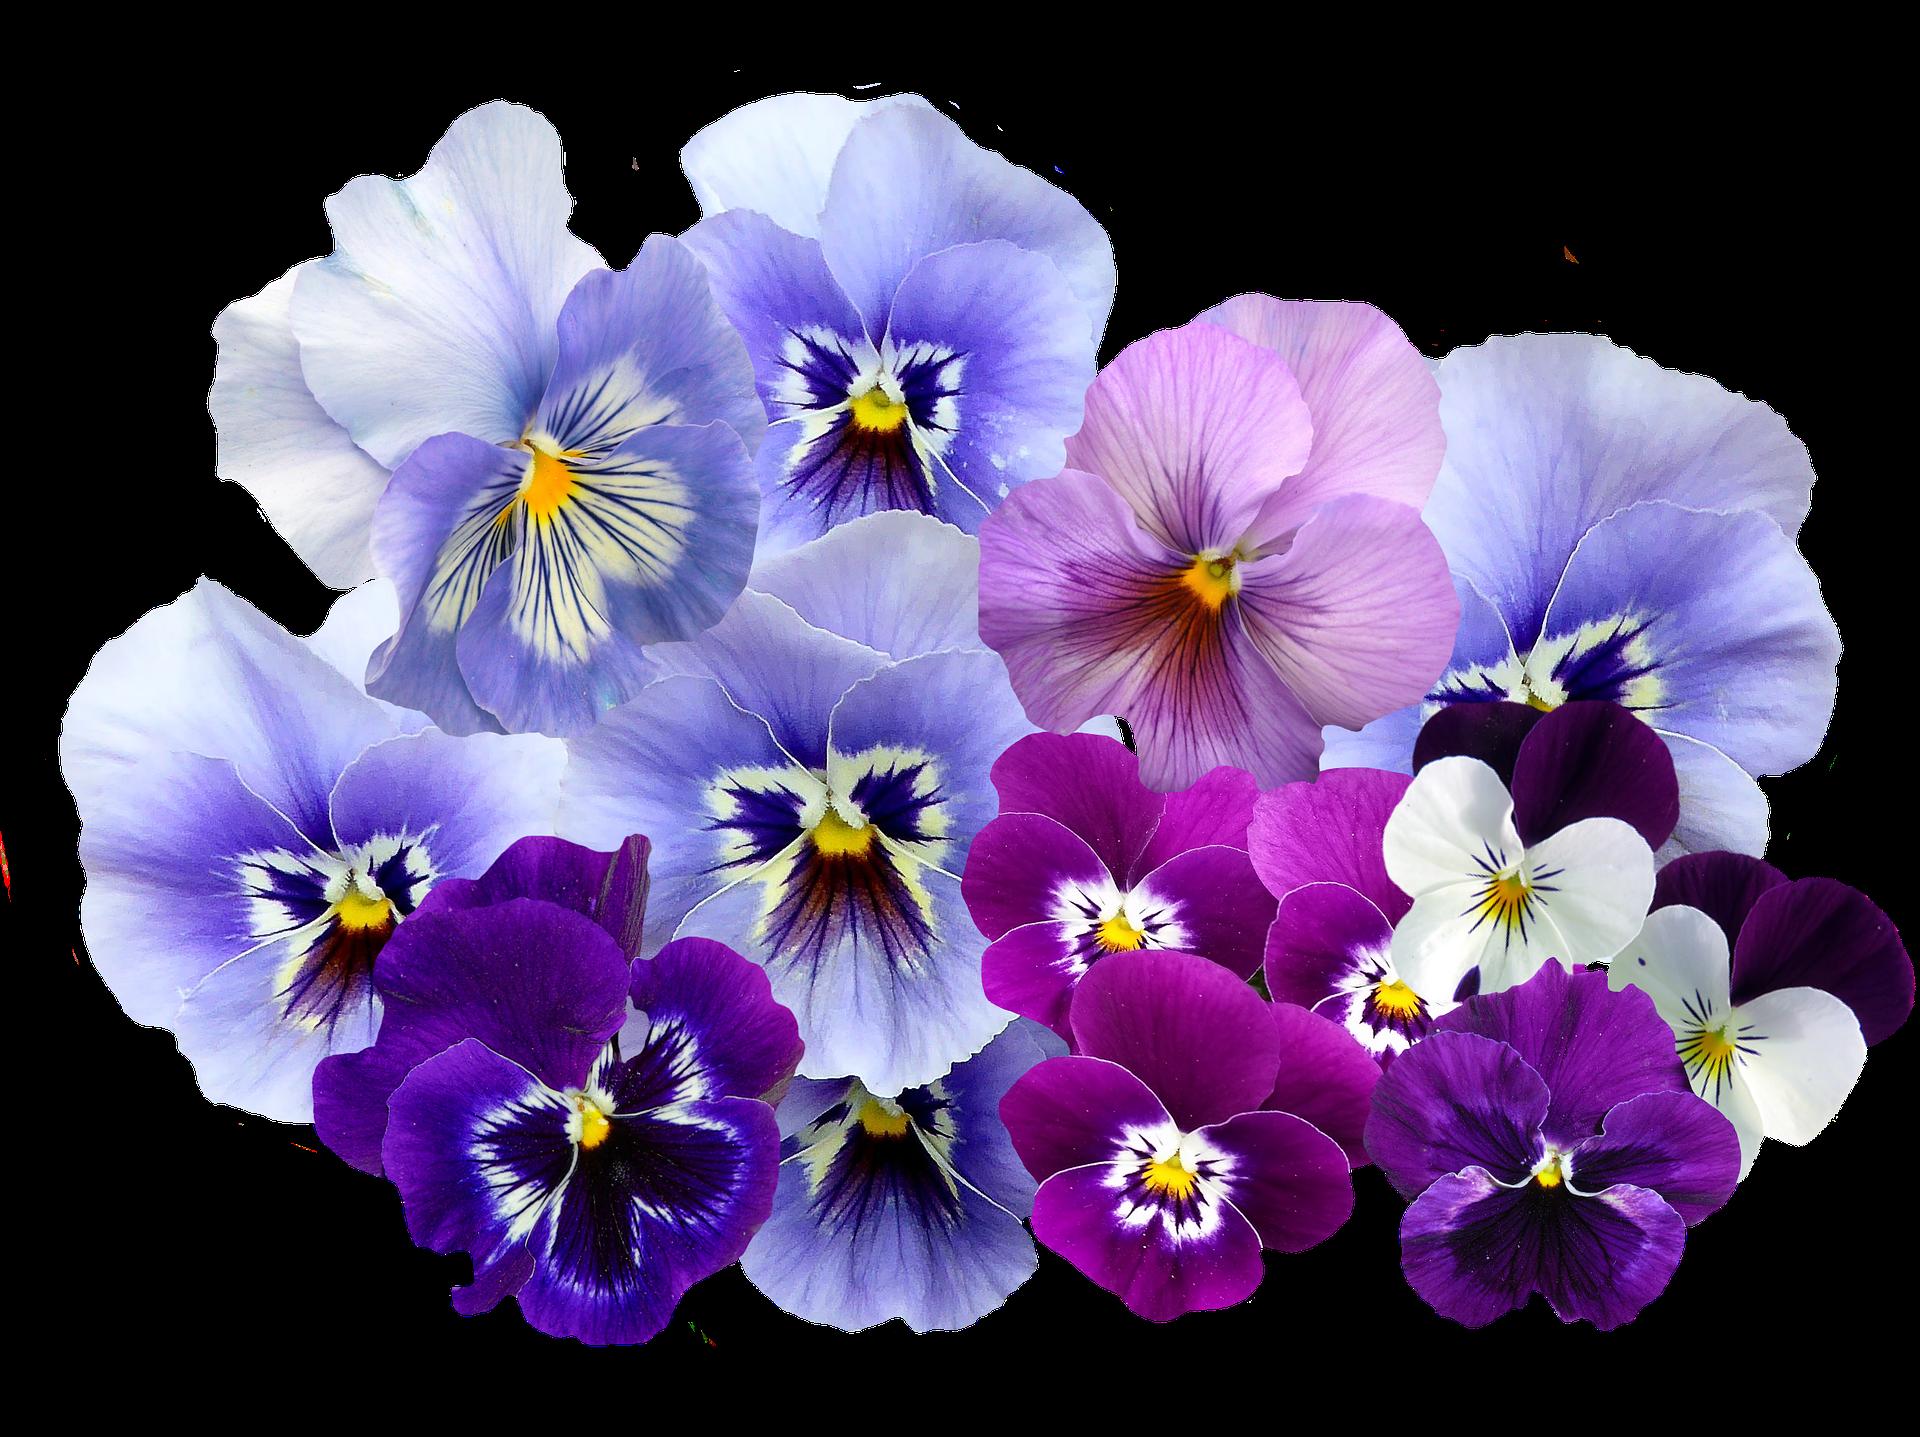 viola fiori da balcone